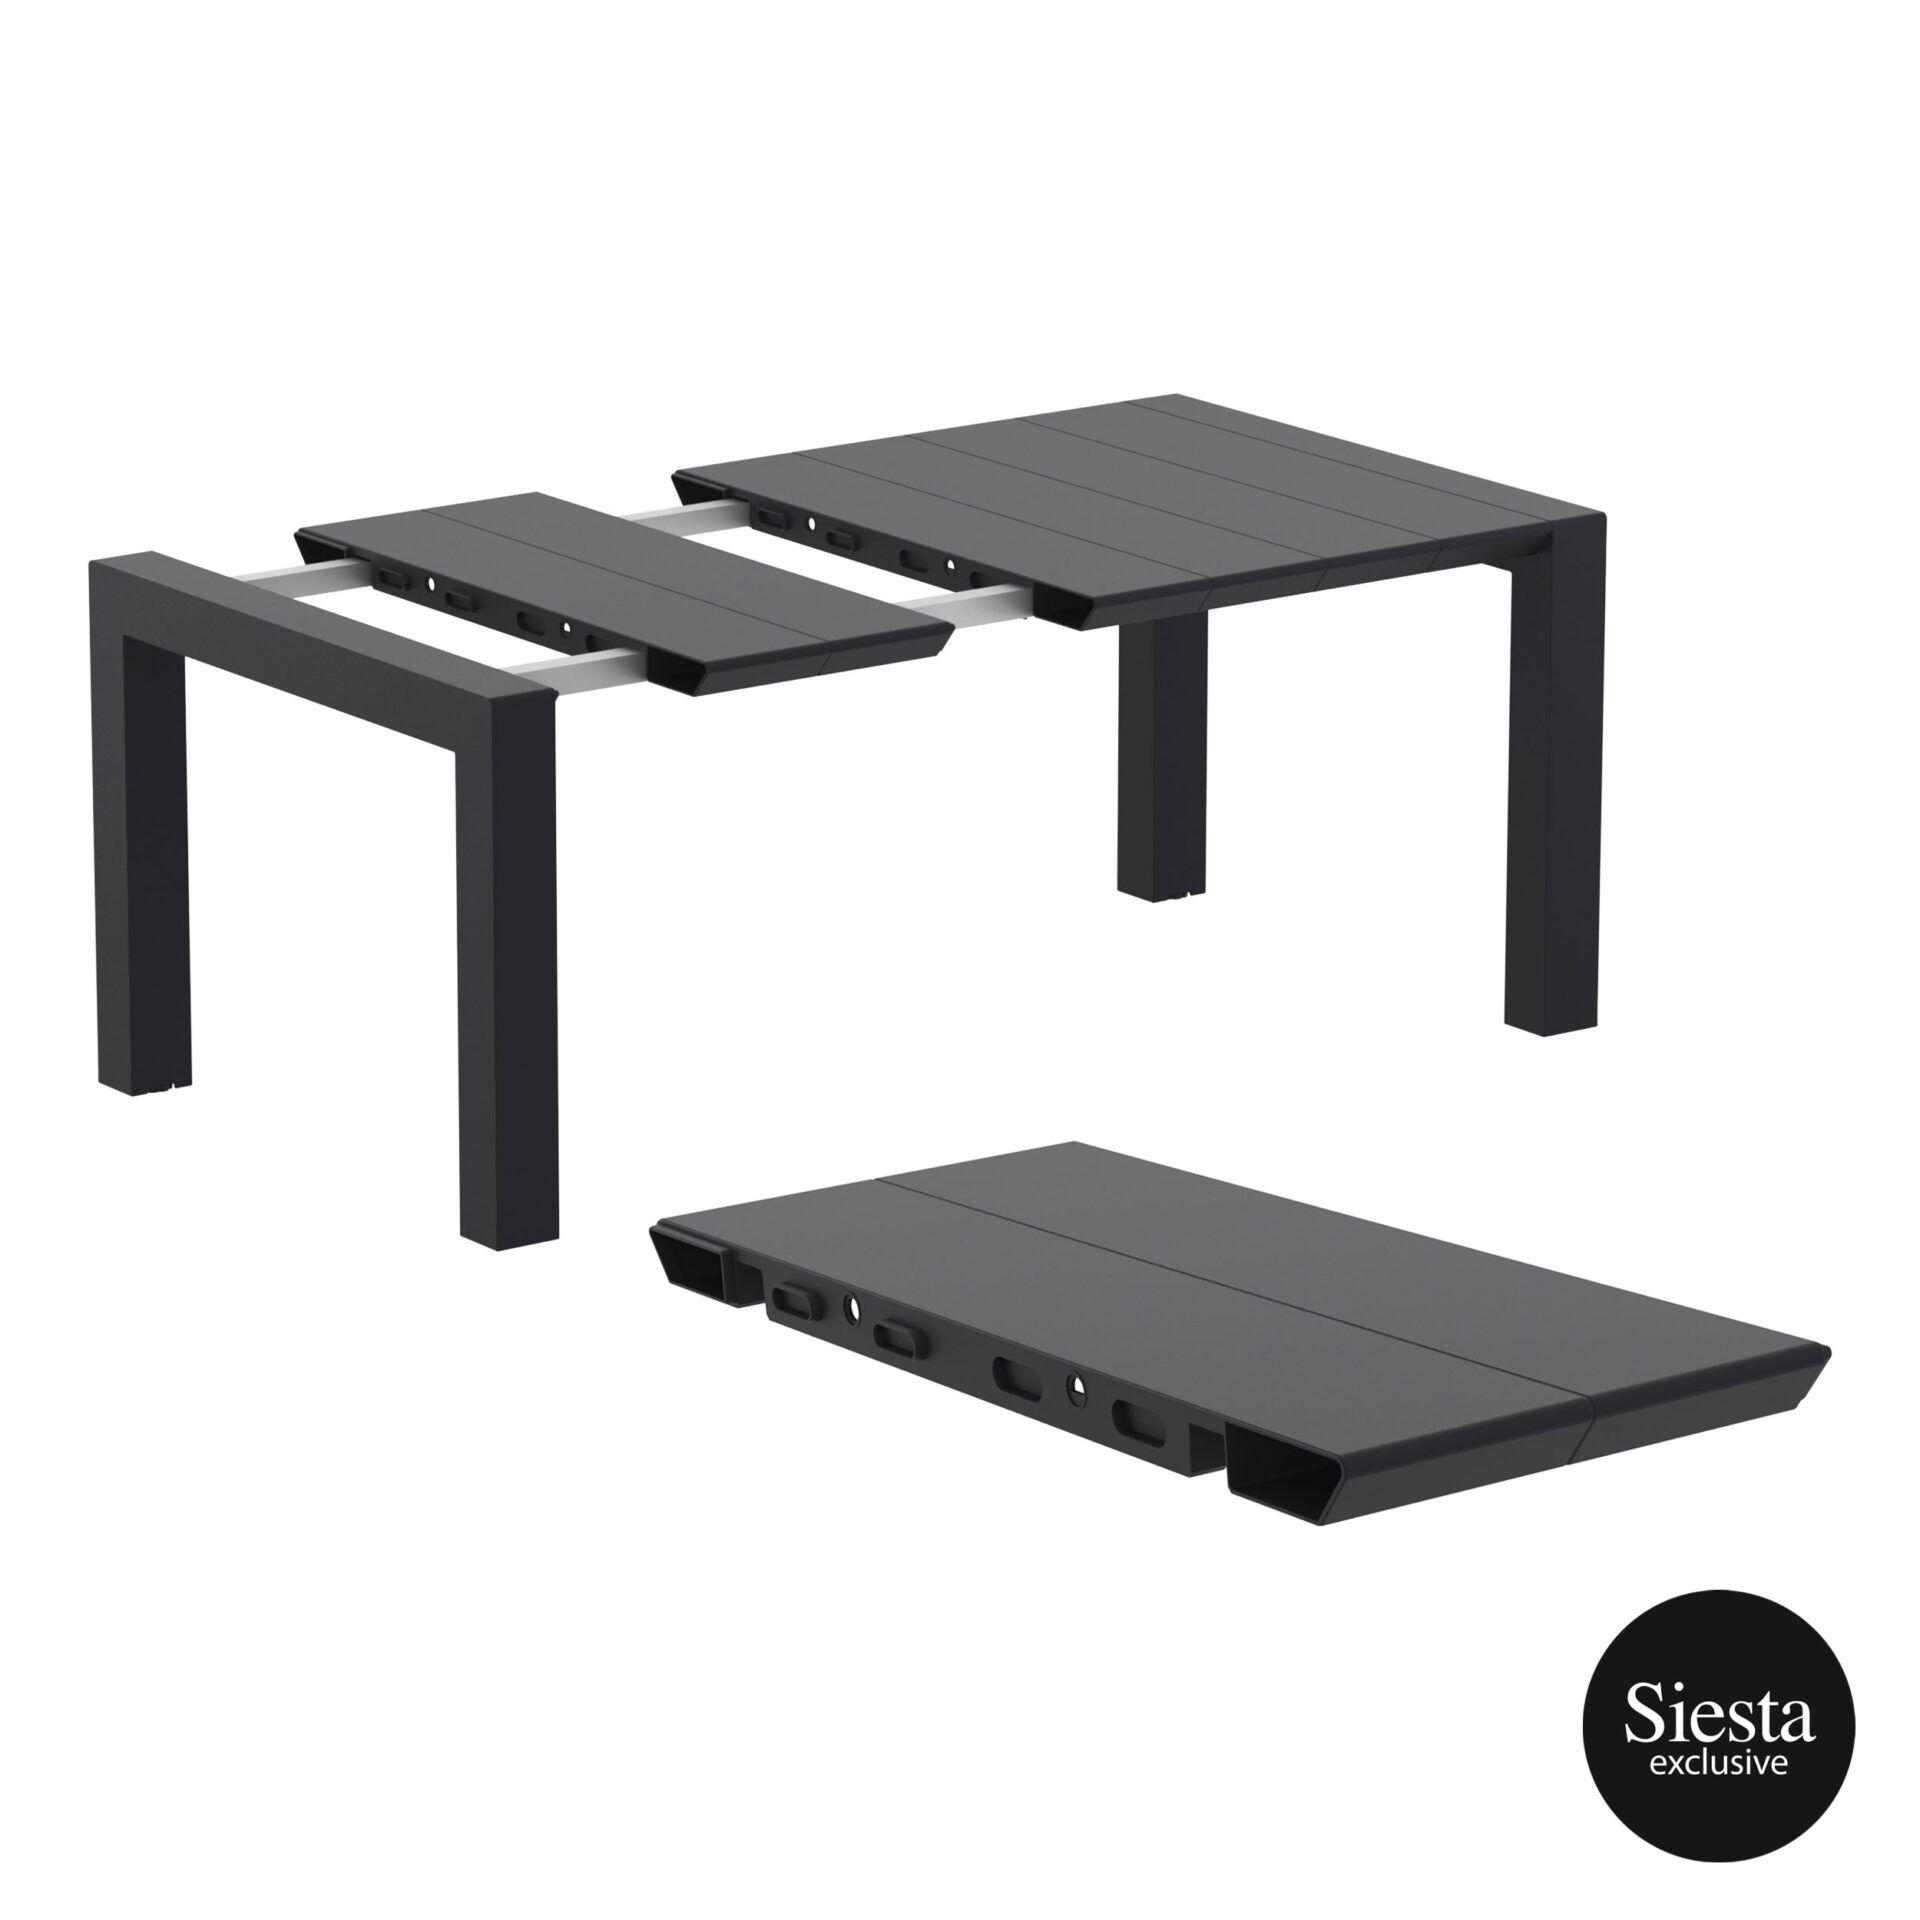 001 vegas table 140 black extension part